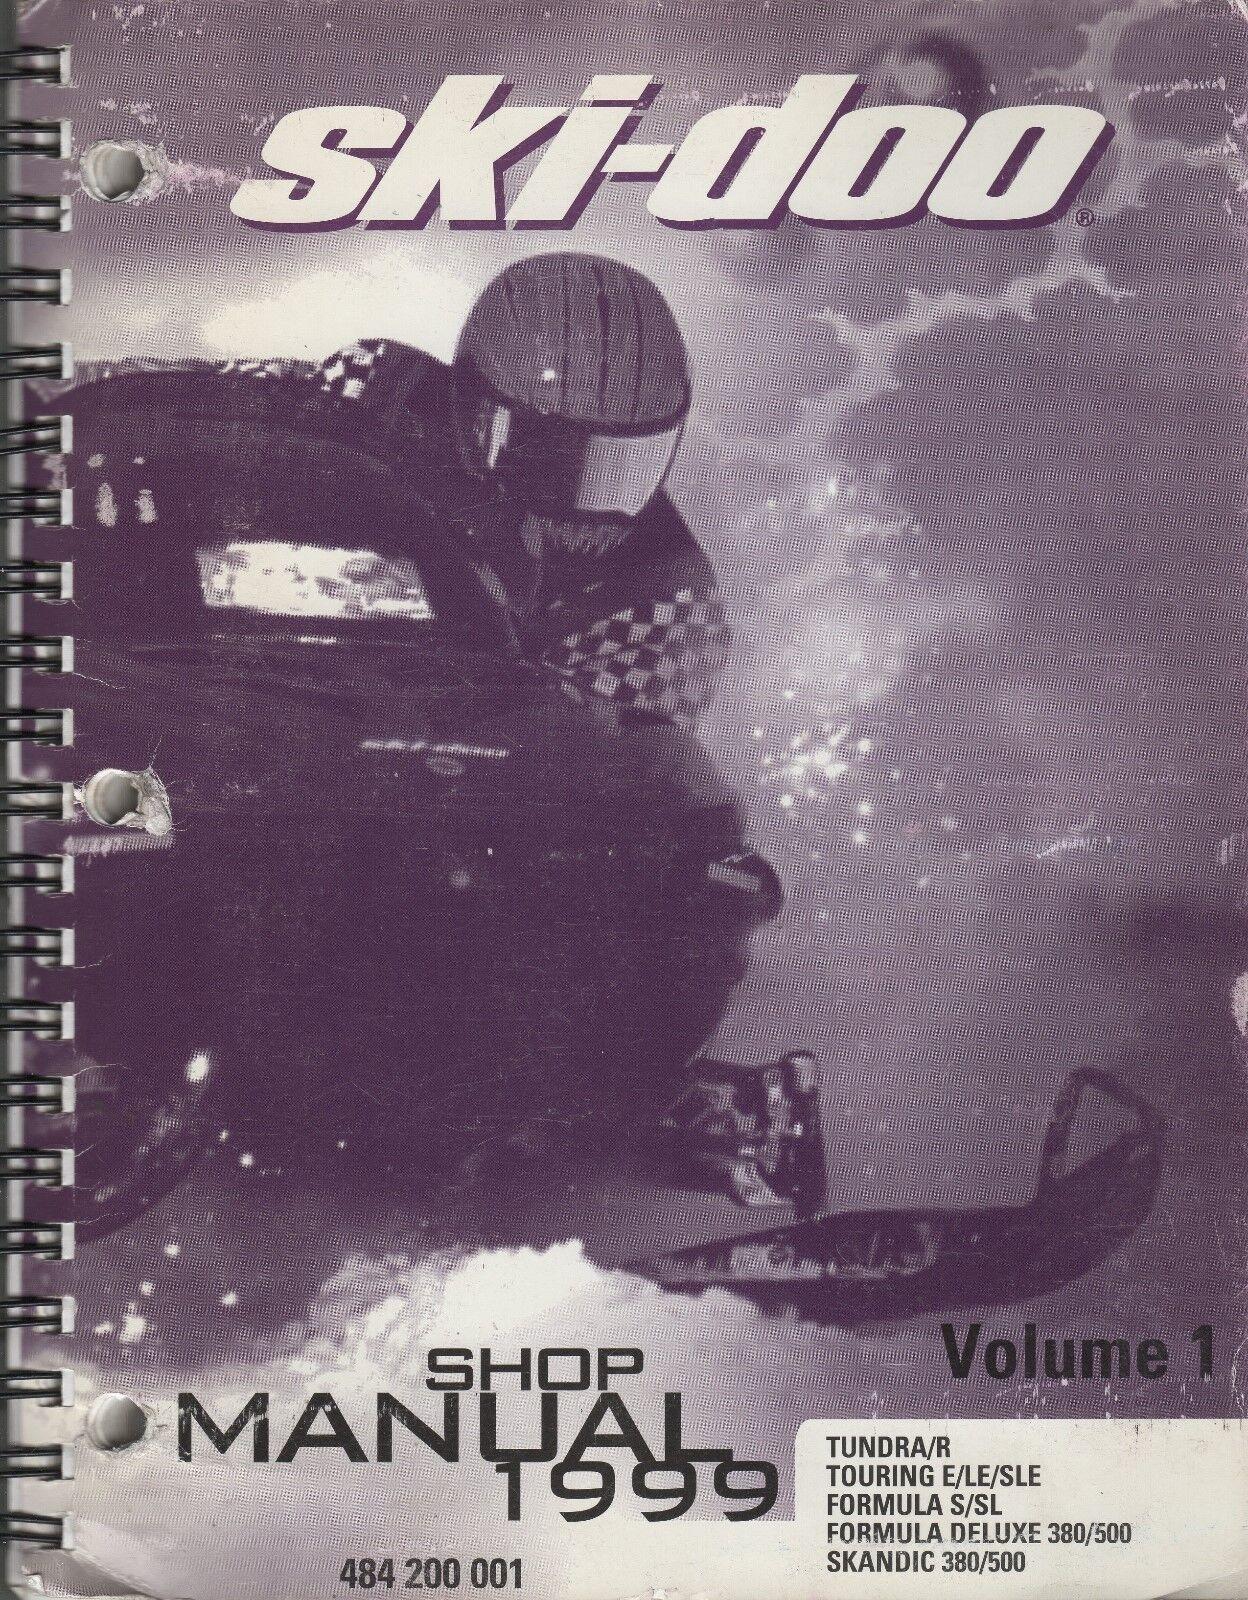 1999 SKI-DOO SNOWMOBILE VOLUME 1 (SEE COVER LIST) SHOP MANUAL 484 200 001 (153)